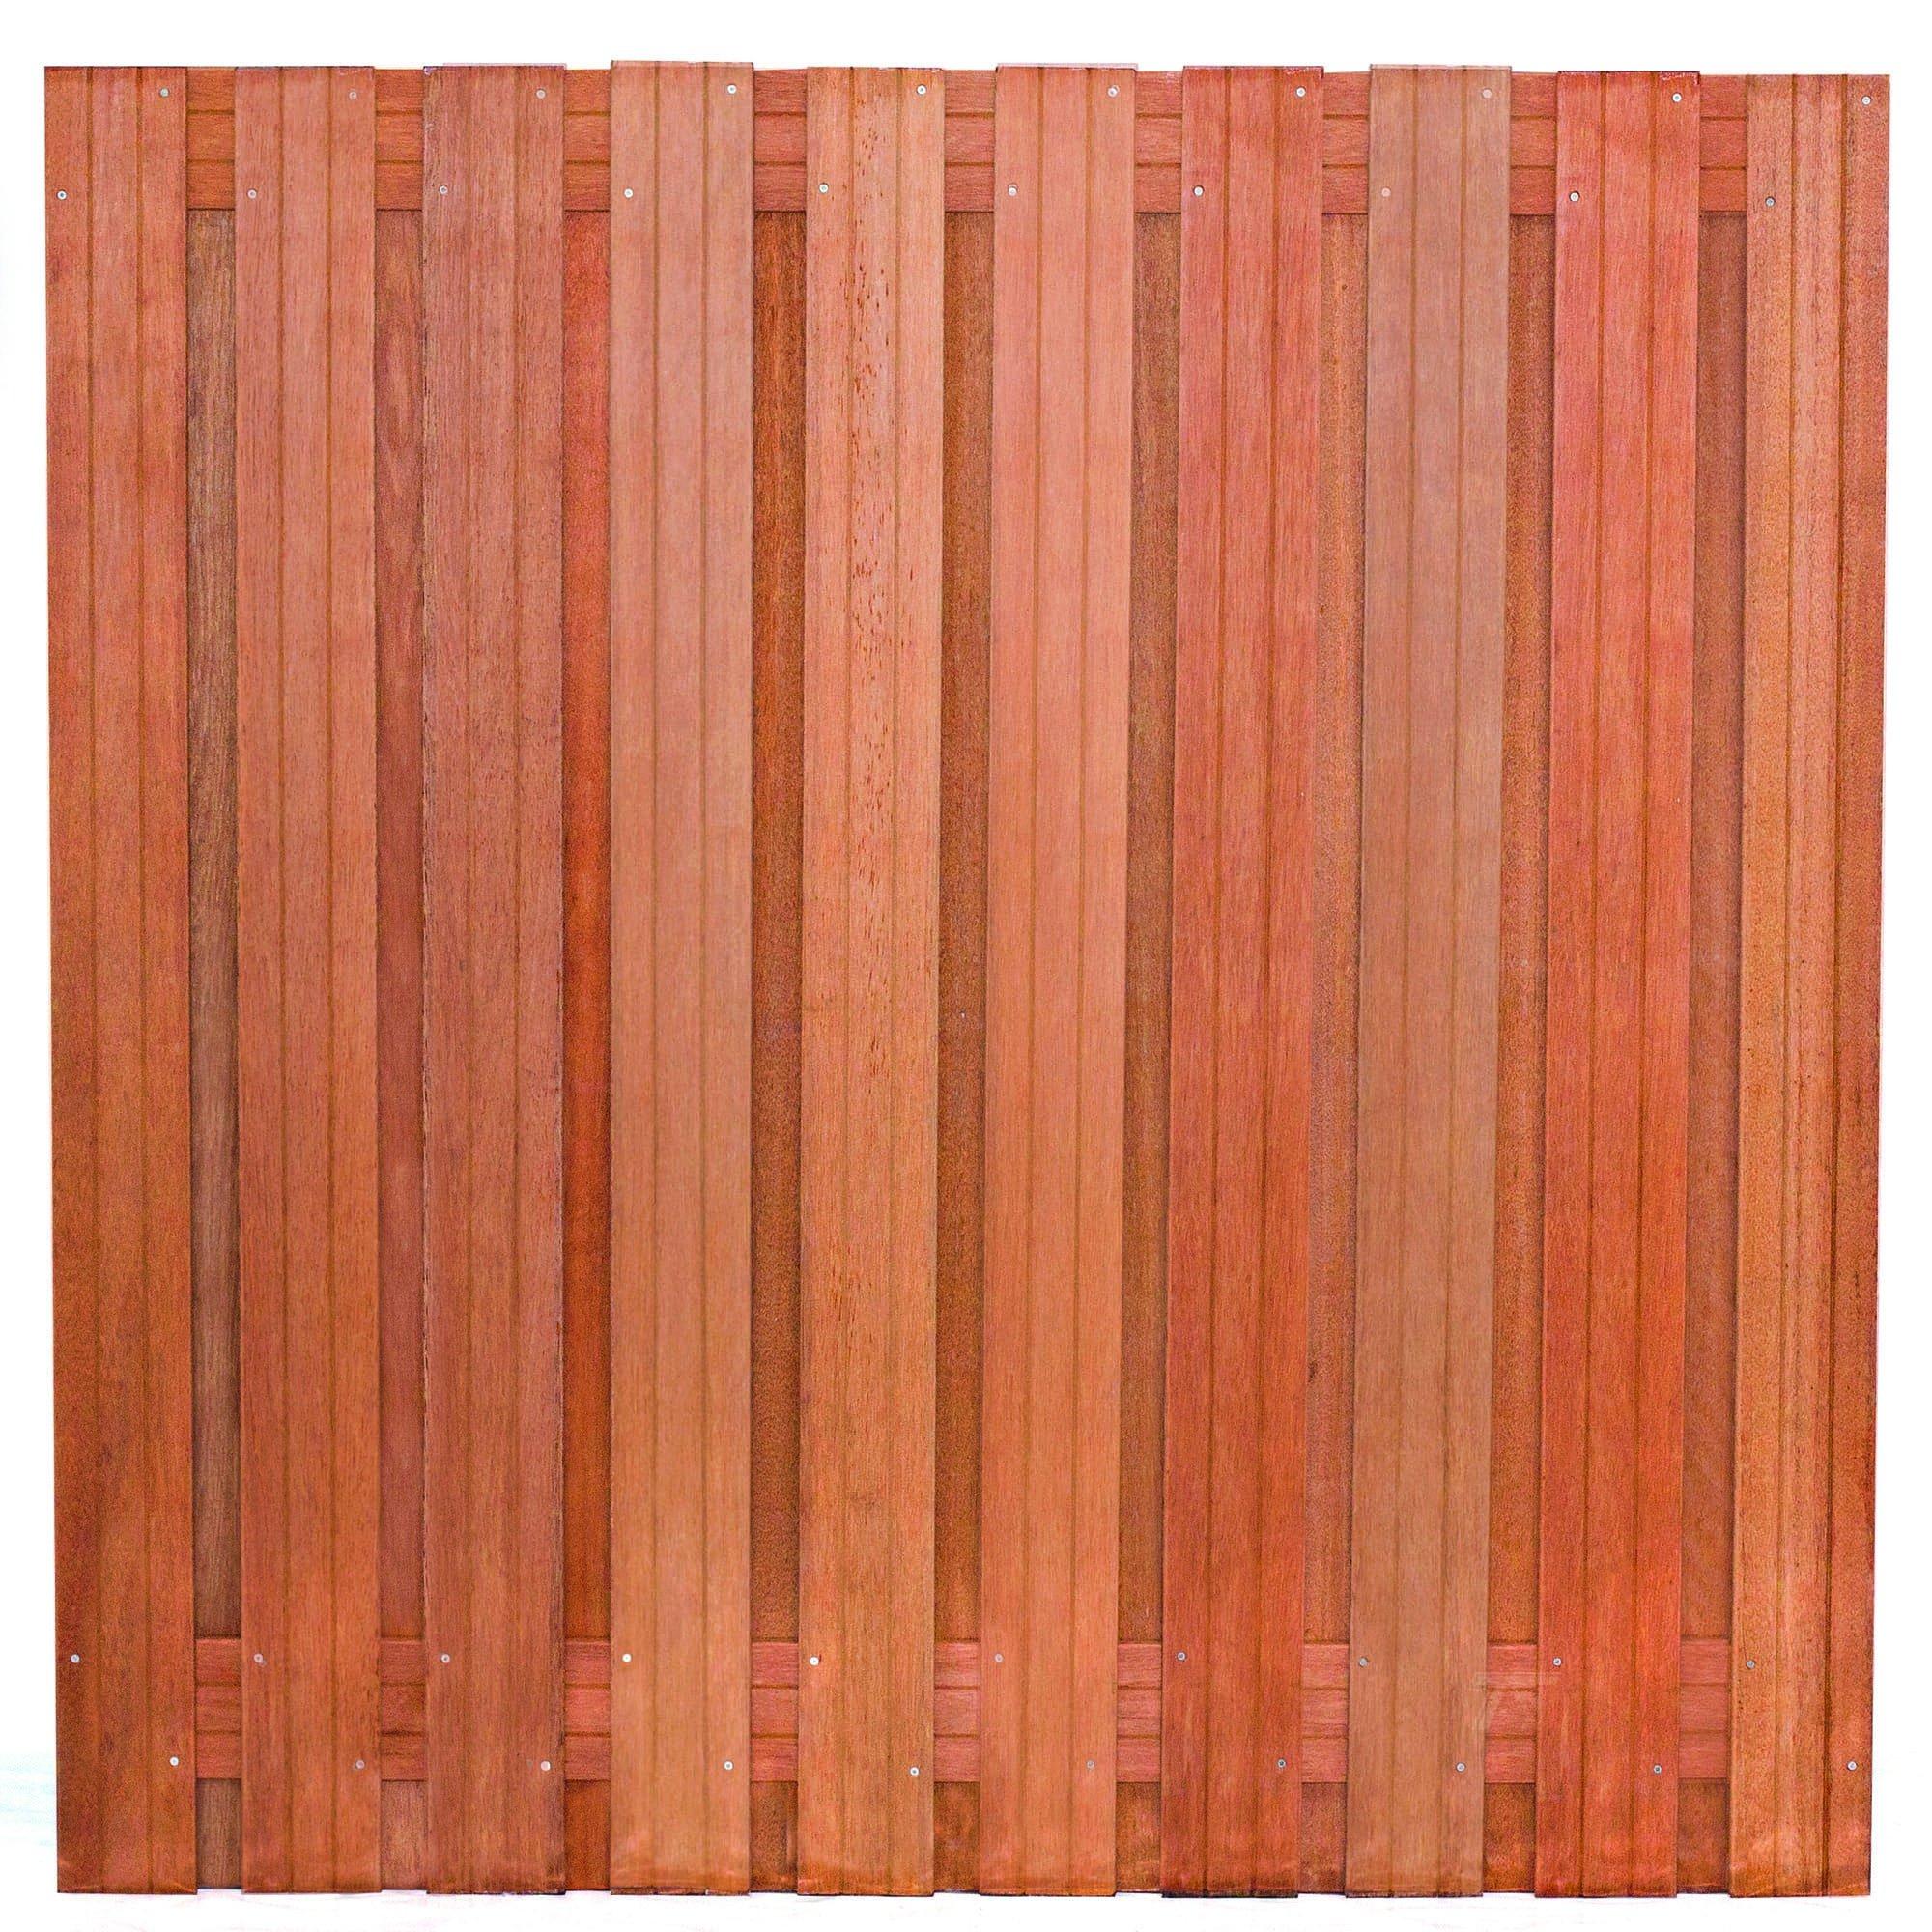 Hardhouten privacy schutting recht 180 x 180 cm. Type: Dronten 180